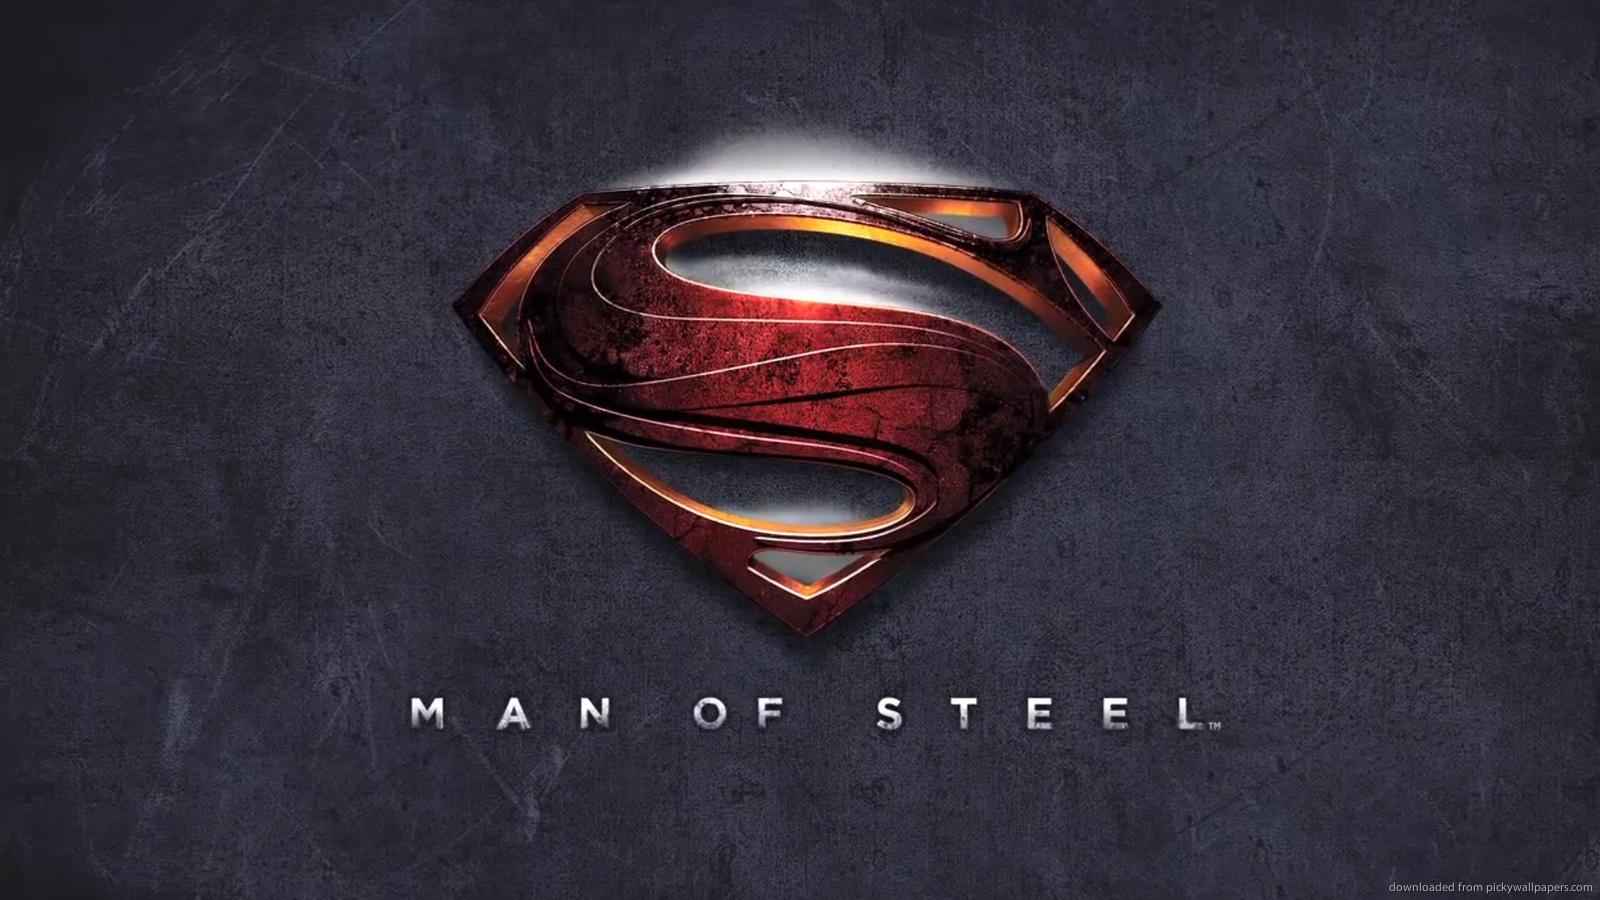 Man of steel wallpapers wallpapersafari 1600x900 man of steel logo wallpaper man of steel logo for 1600x900 biocorpaavc